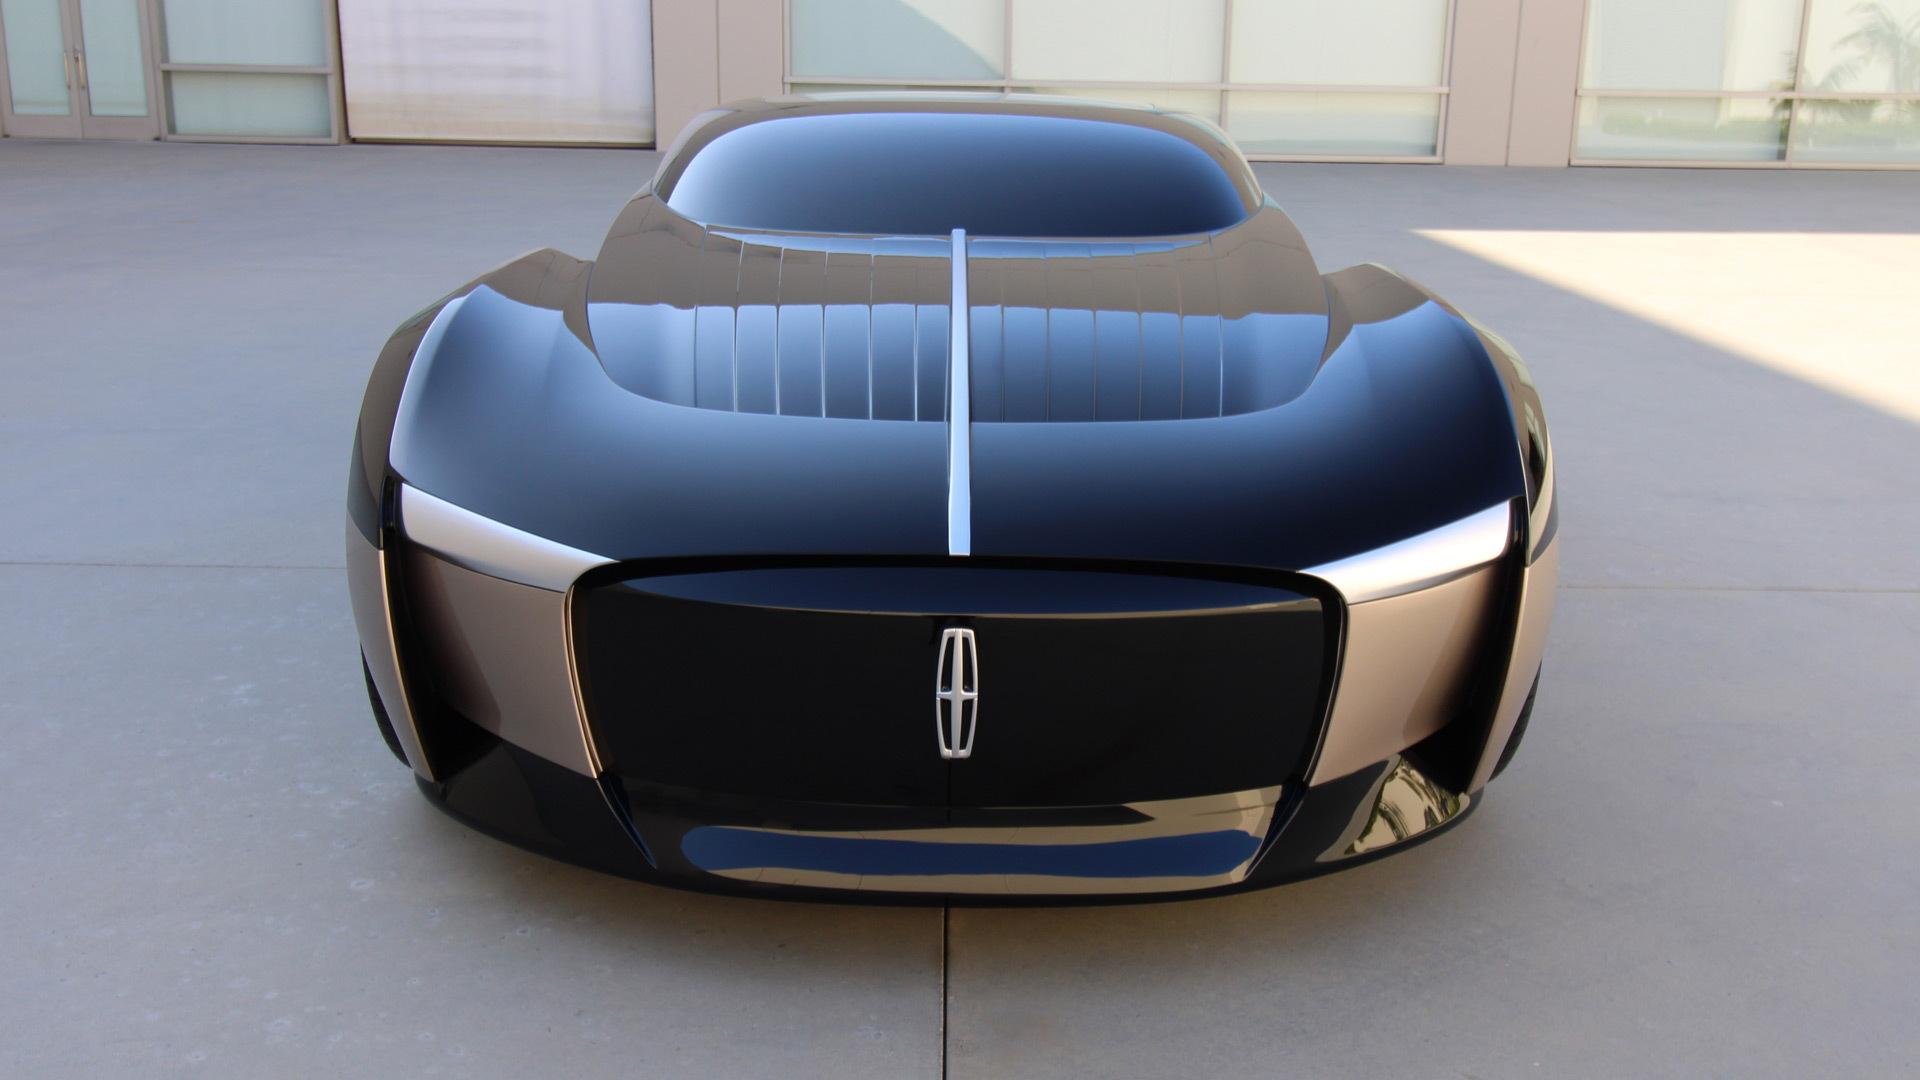 Lincoln Anniversary concept - ArtCenter Design Project